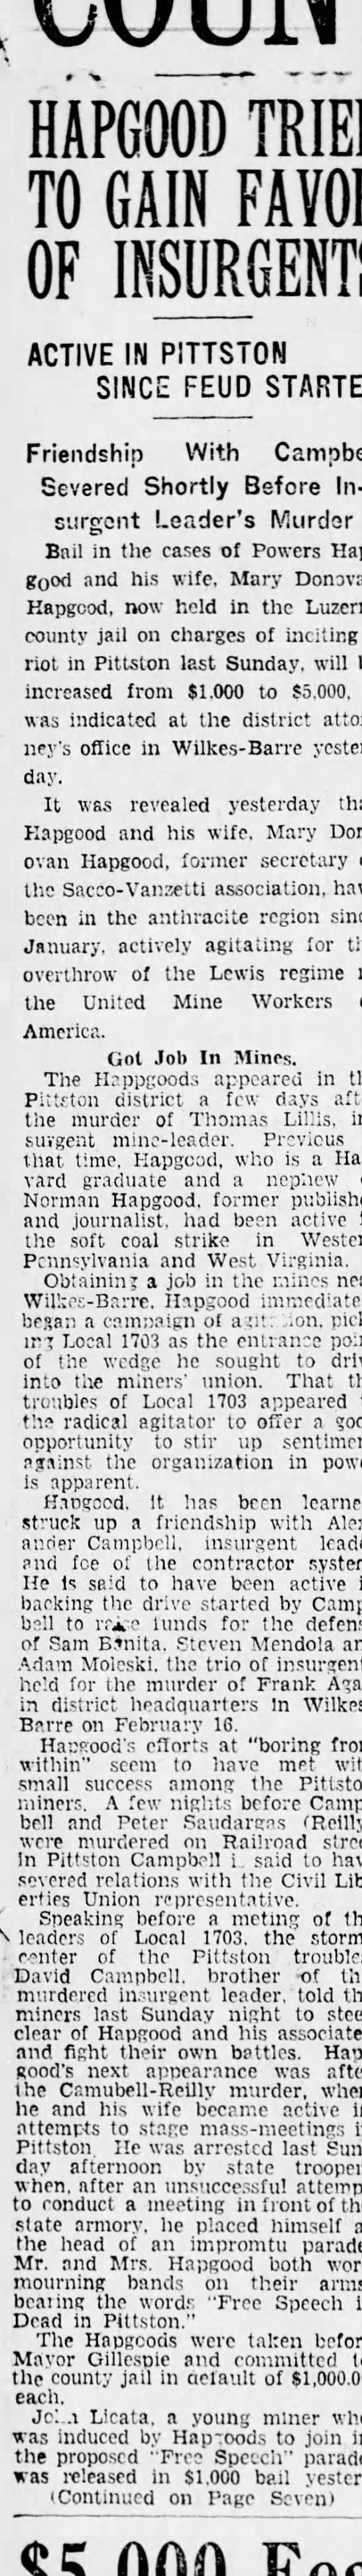 Scranton Republican, 7 March 1928, page 3 - HAPGOOD TRIED TO GAIN FAVOR OF INSURGENTS...